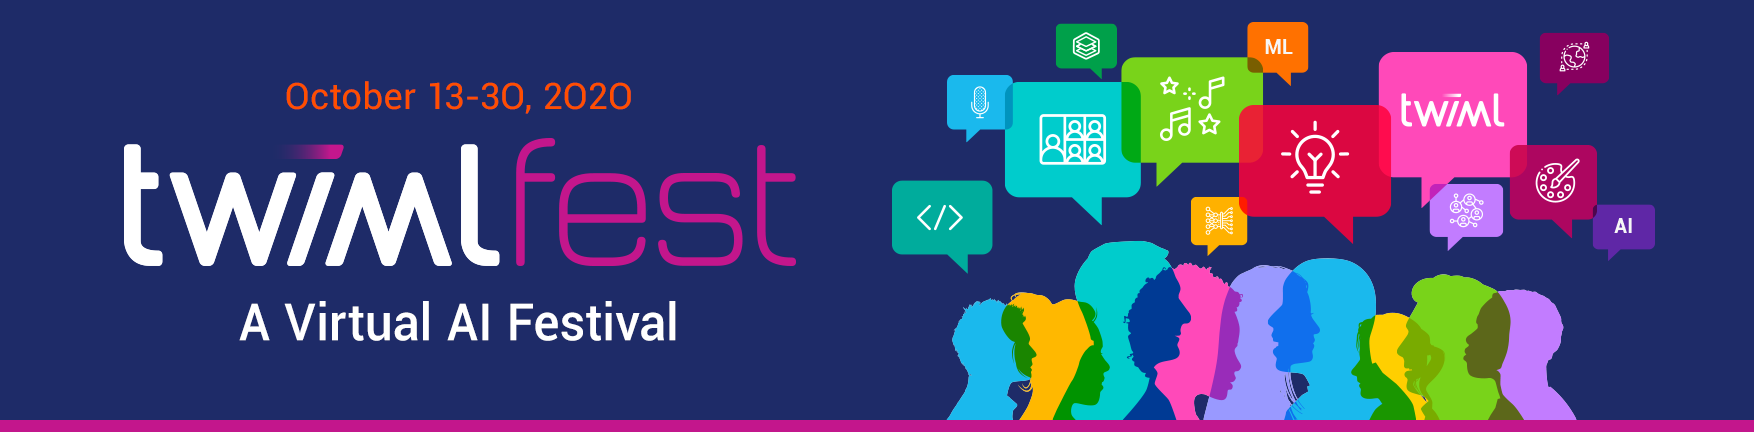 TWIMLfest Banner: Virtual AI Festival